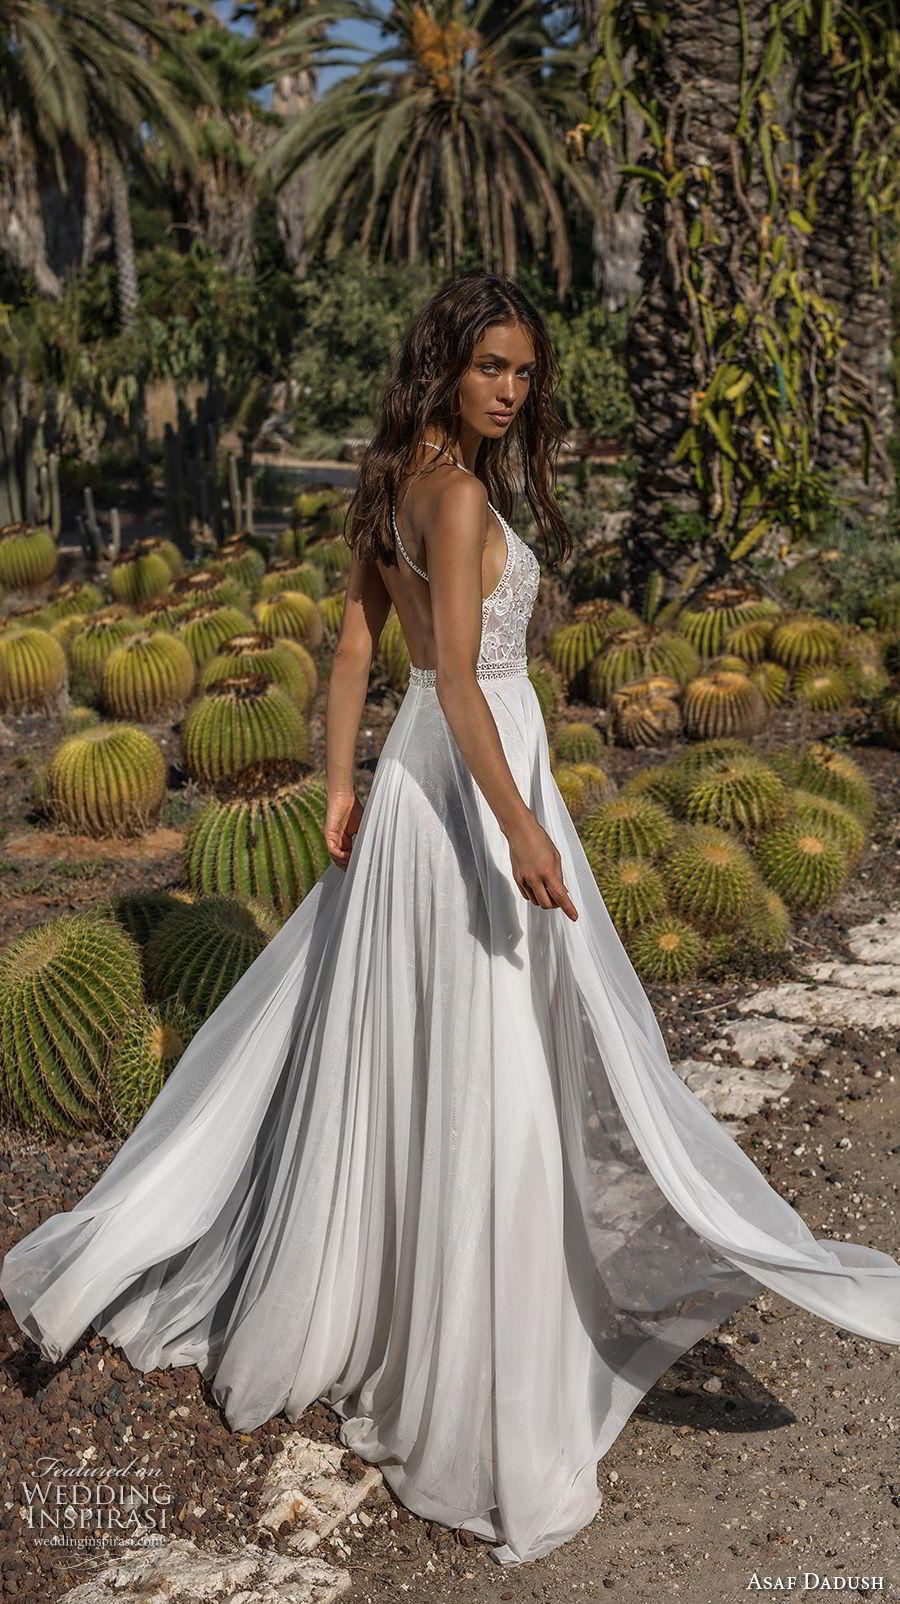 asaf dadush 2018 bridal sleevless halter jswel neck heavily embellished bodice double slit skirt romantic soft a  line wedding dress open back sweep train (11) bv